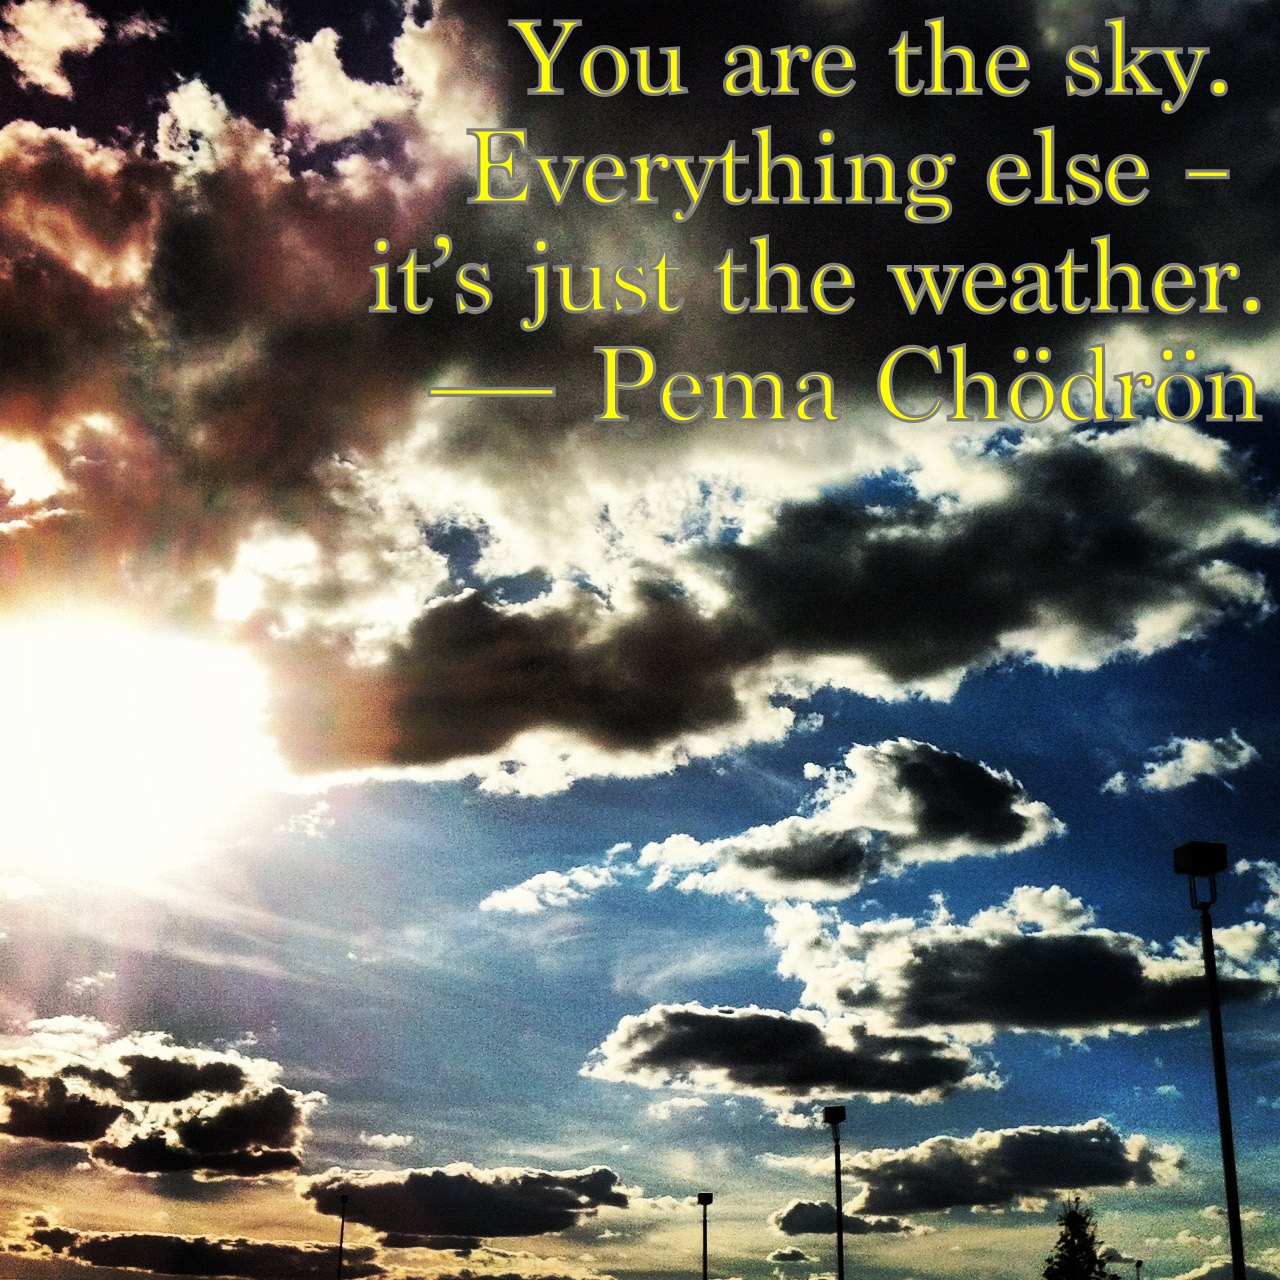 Pema - Sky image.jpg